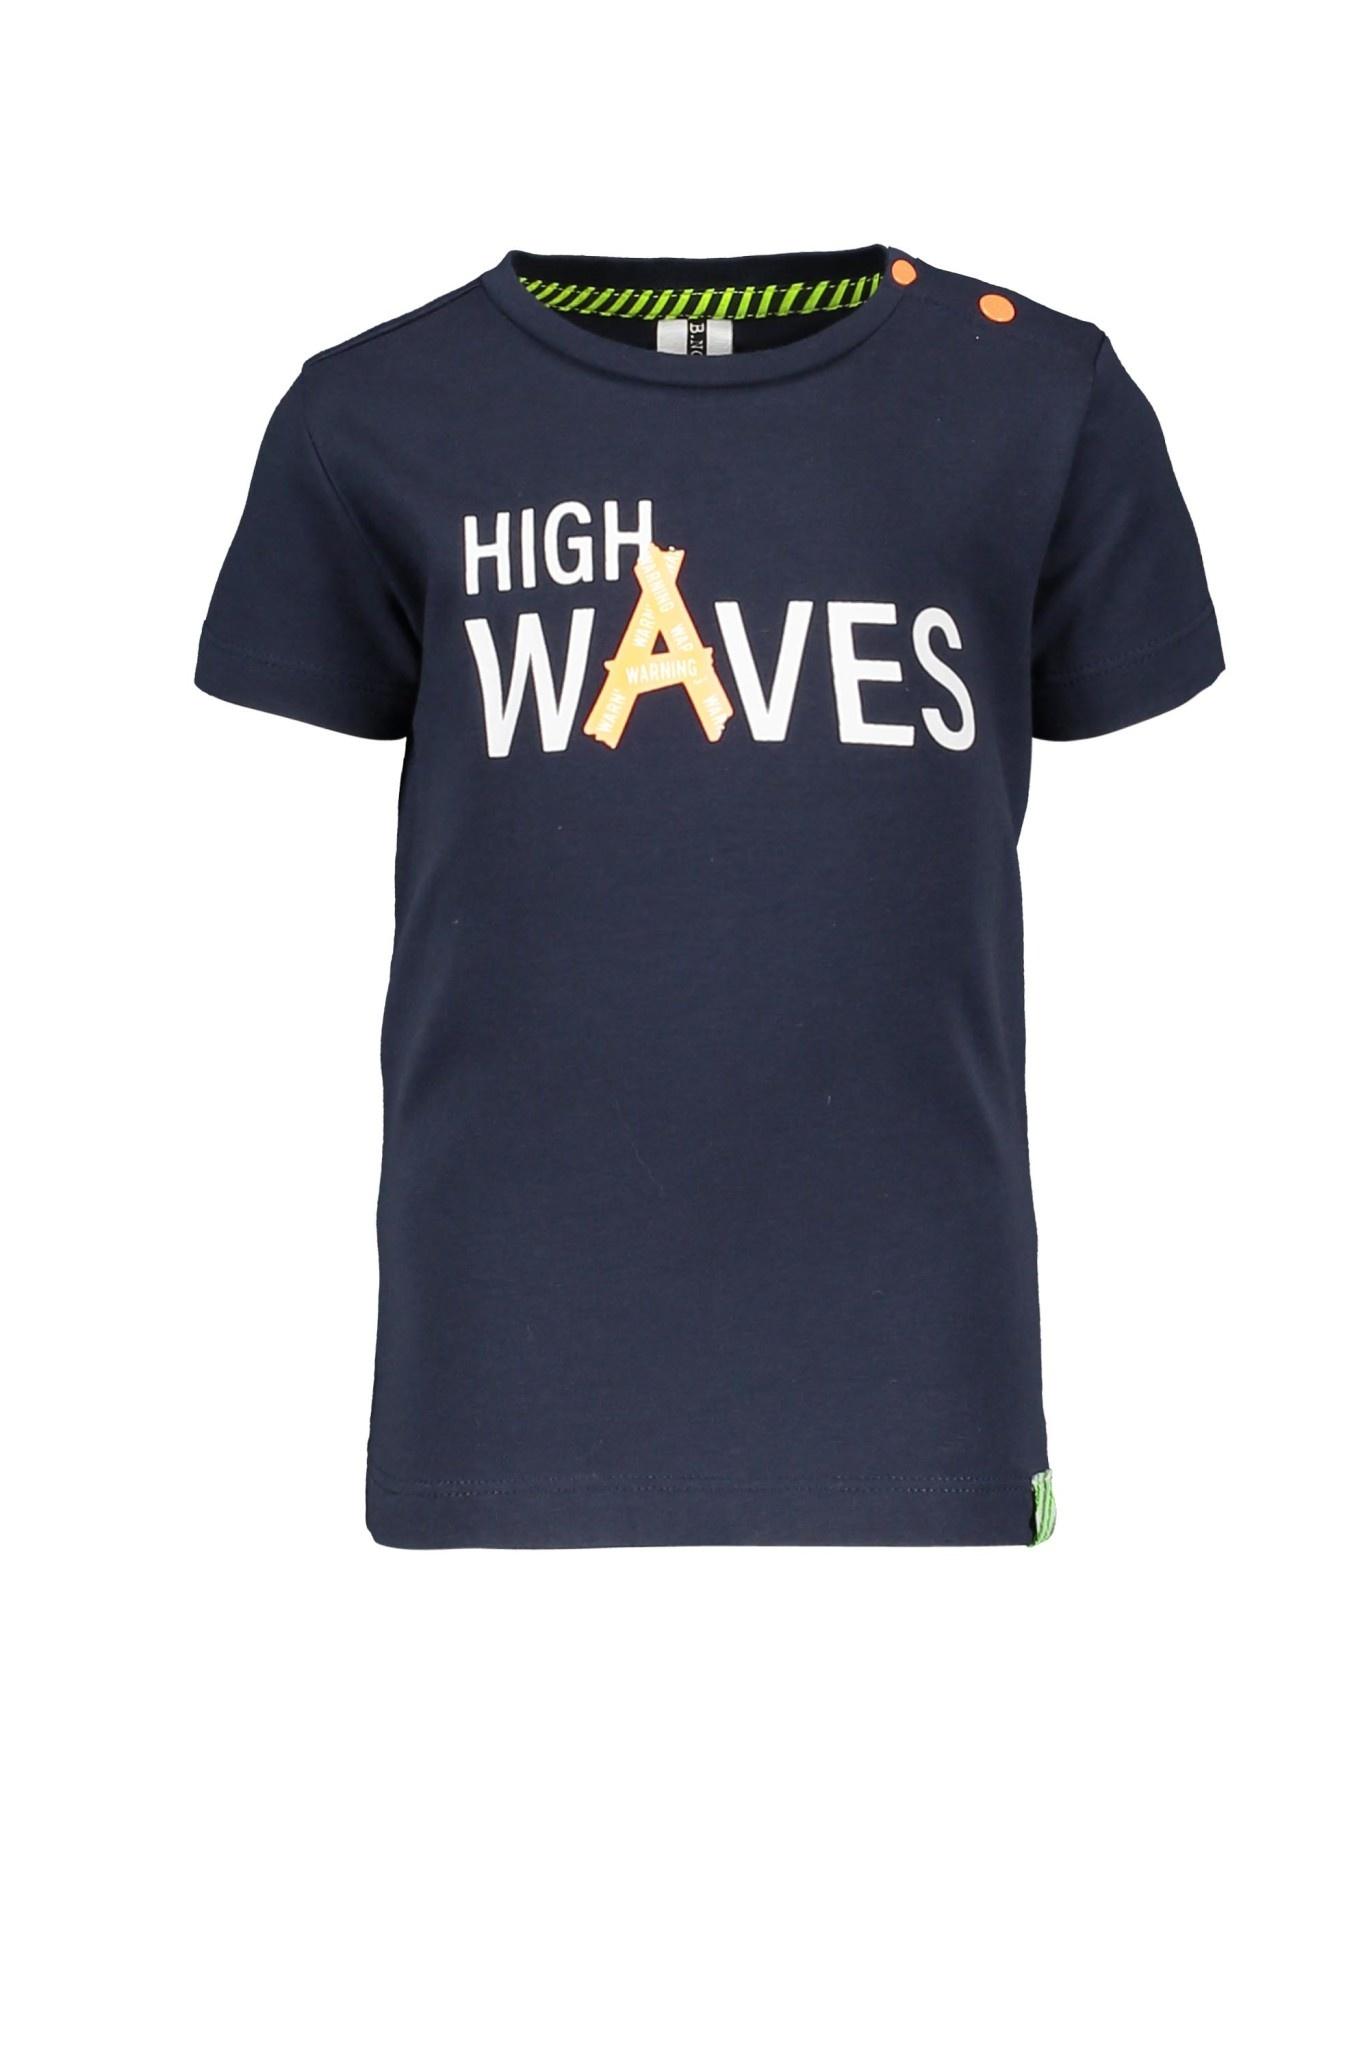 High Waves Tee